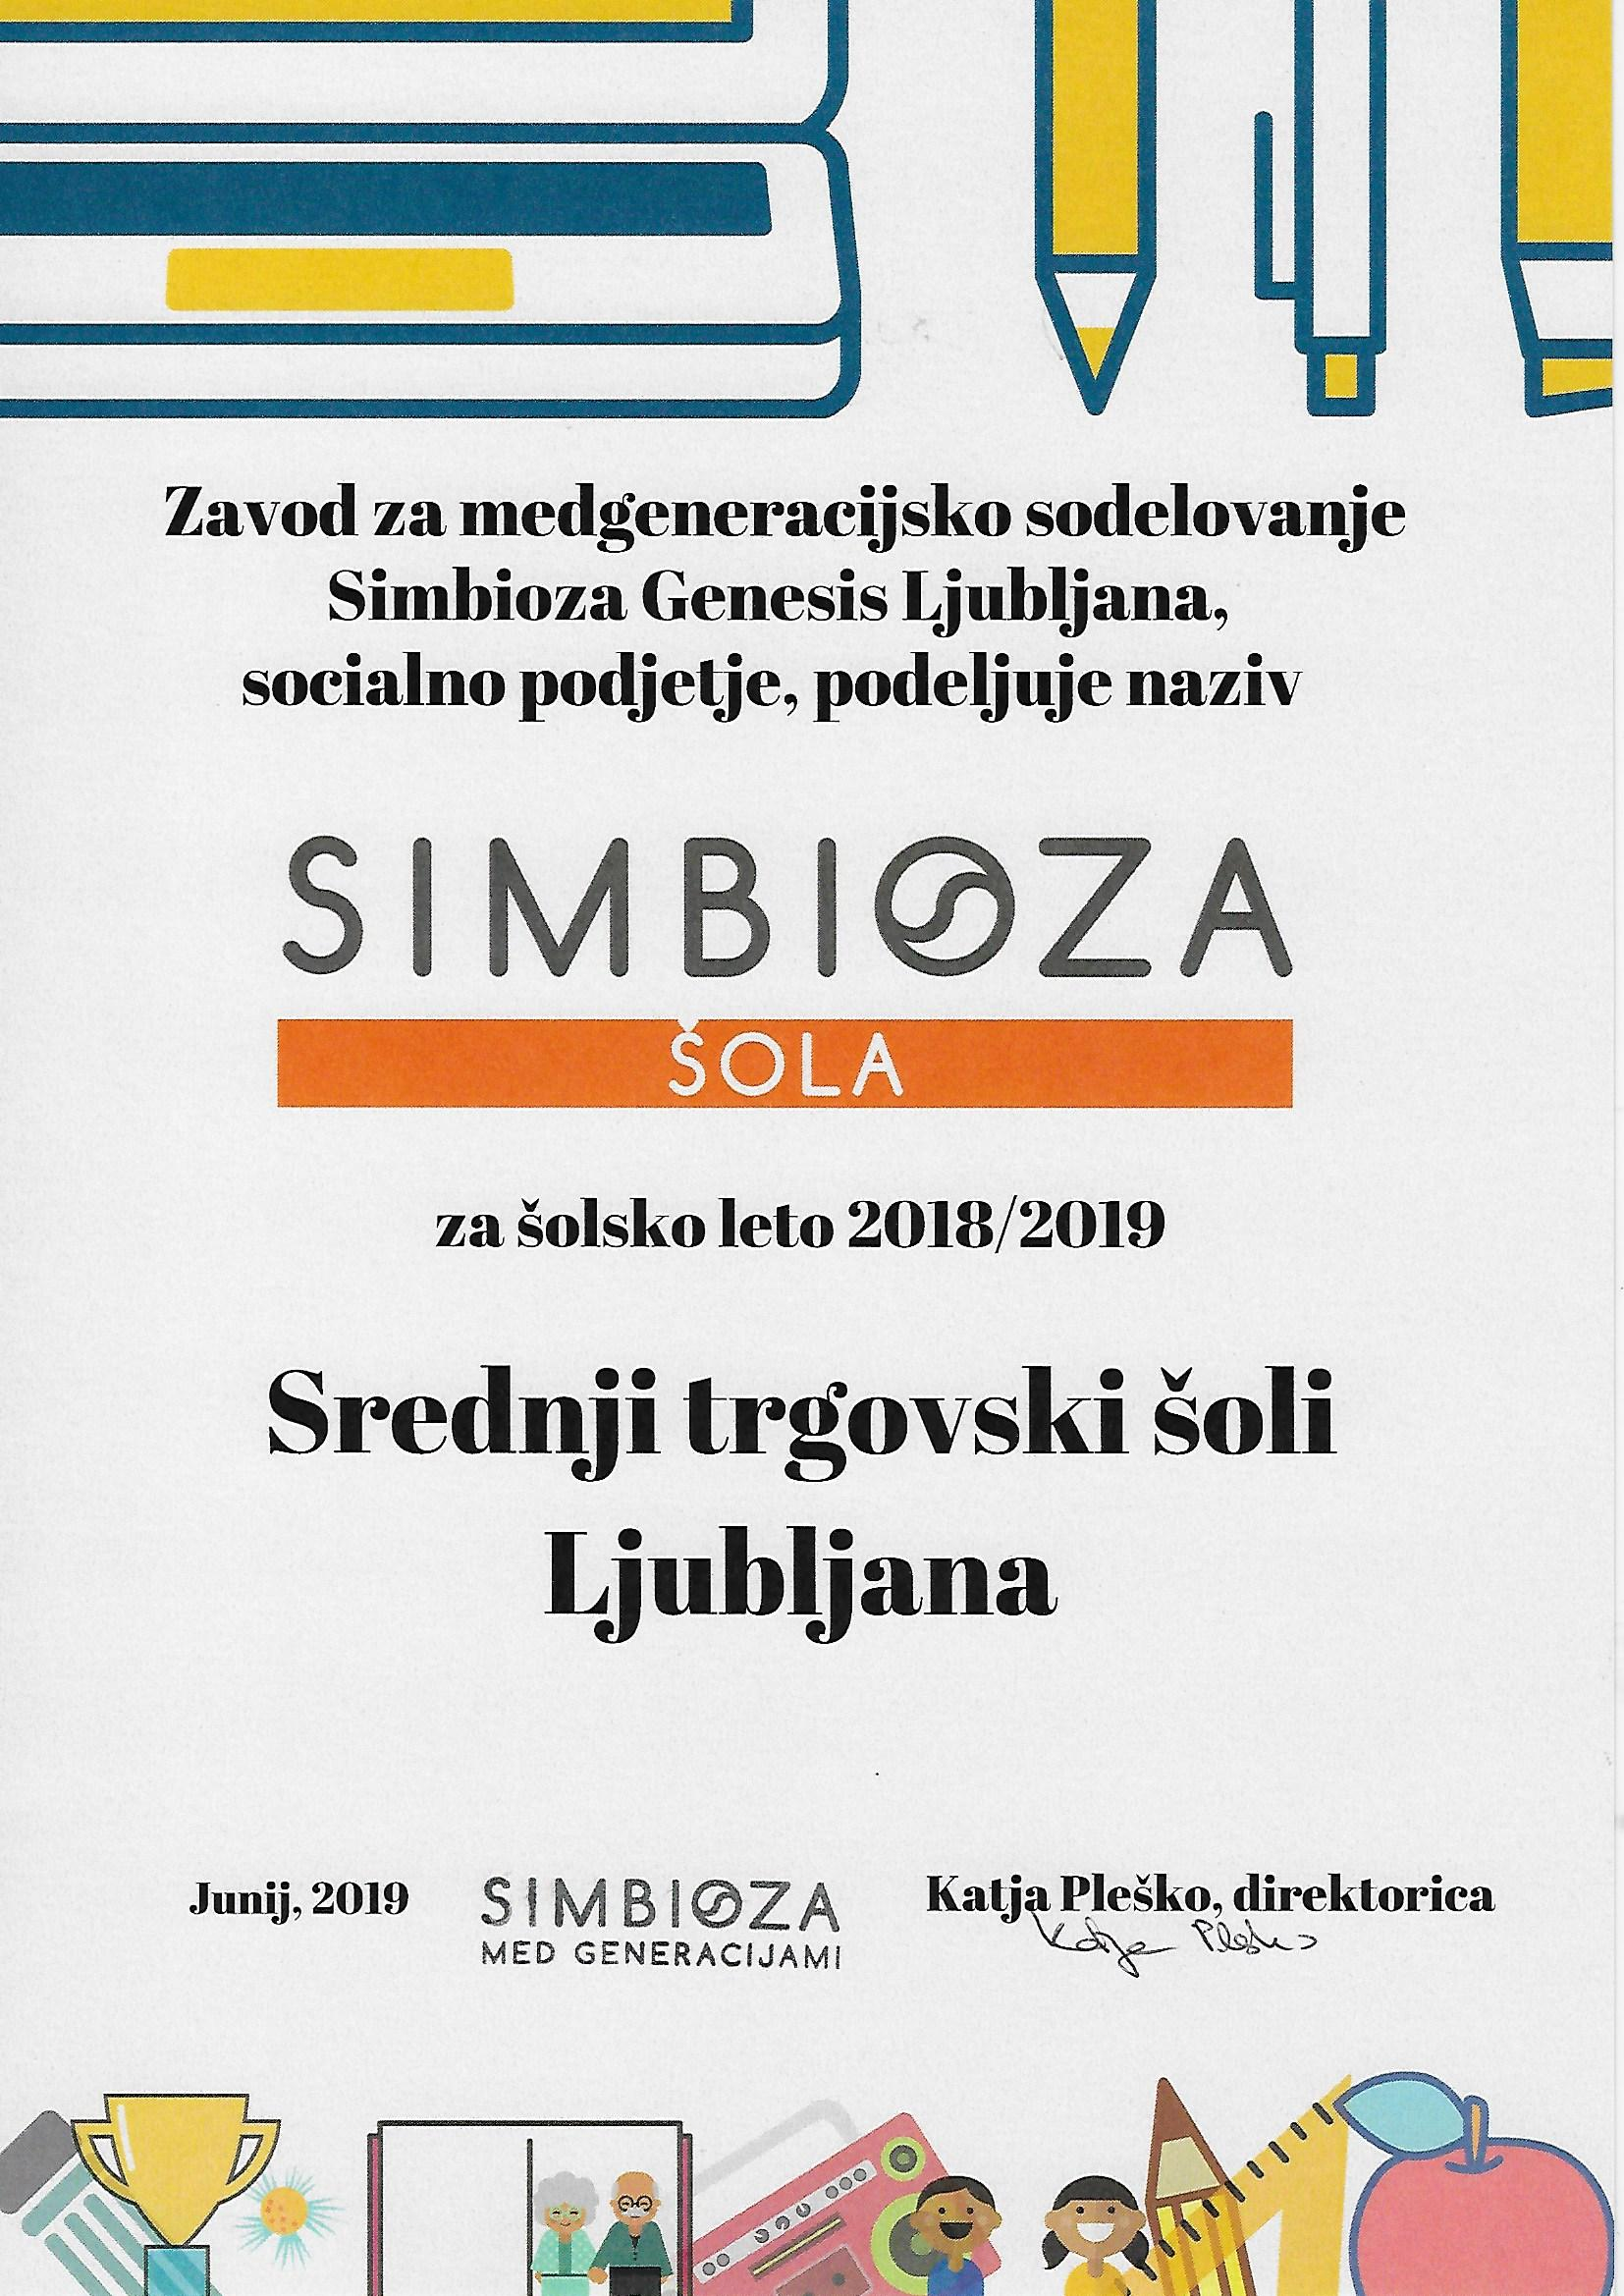 Simbioza 2018/19